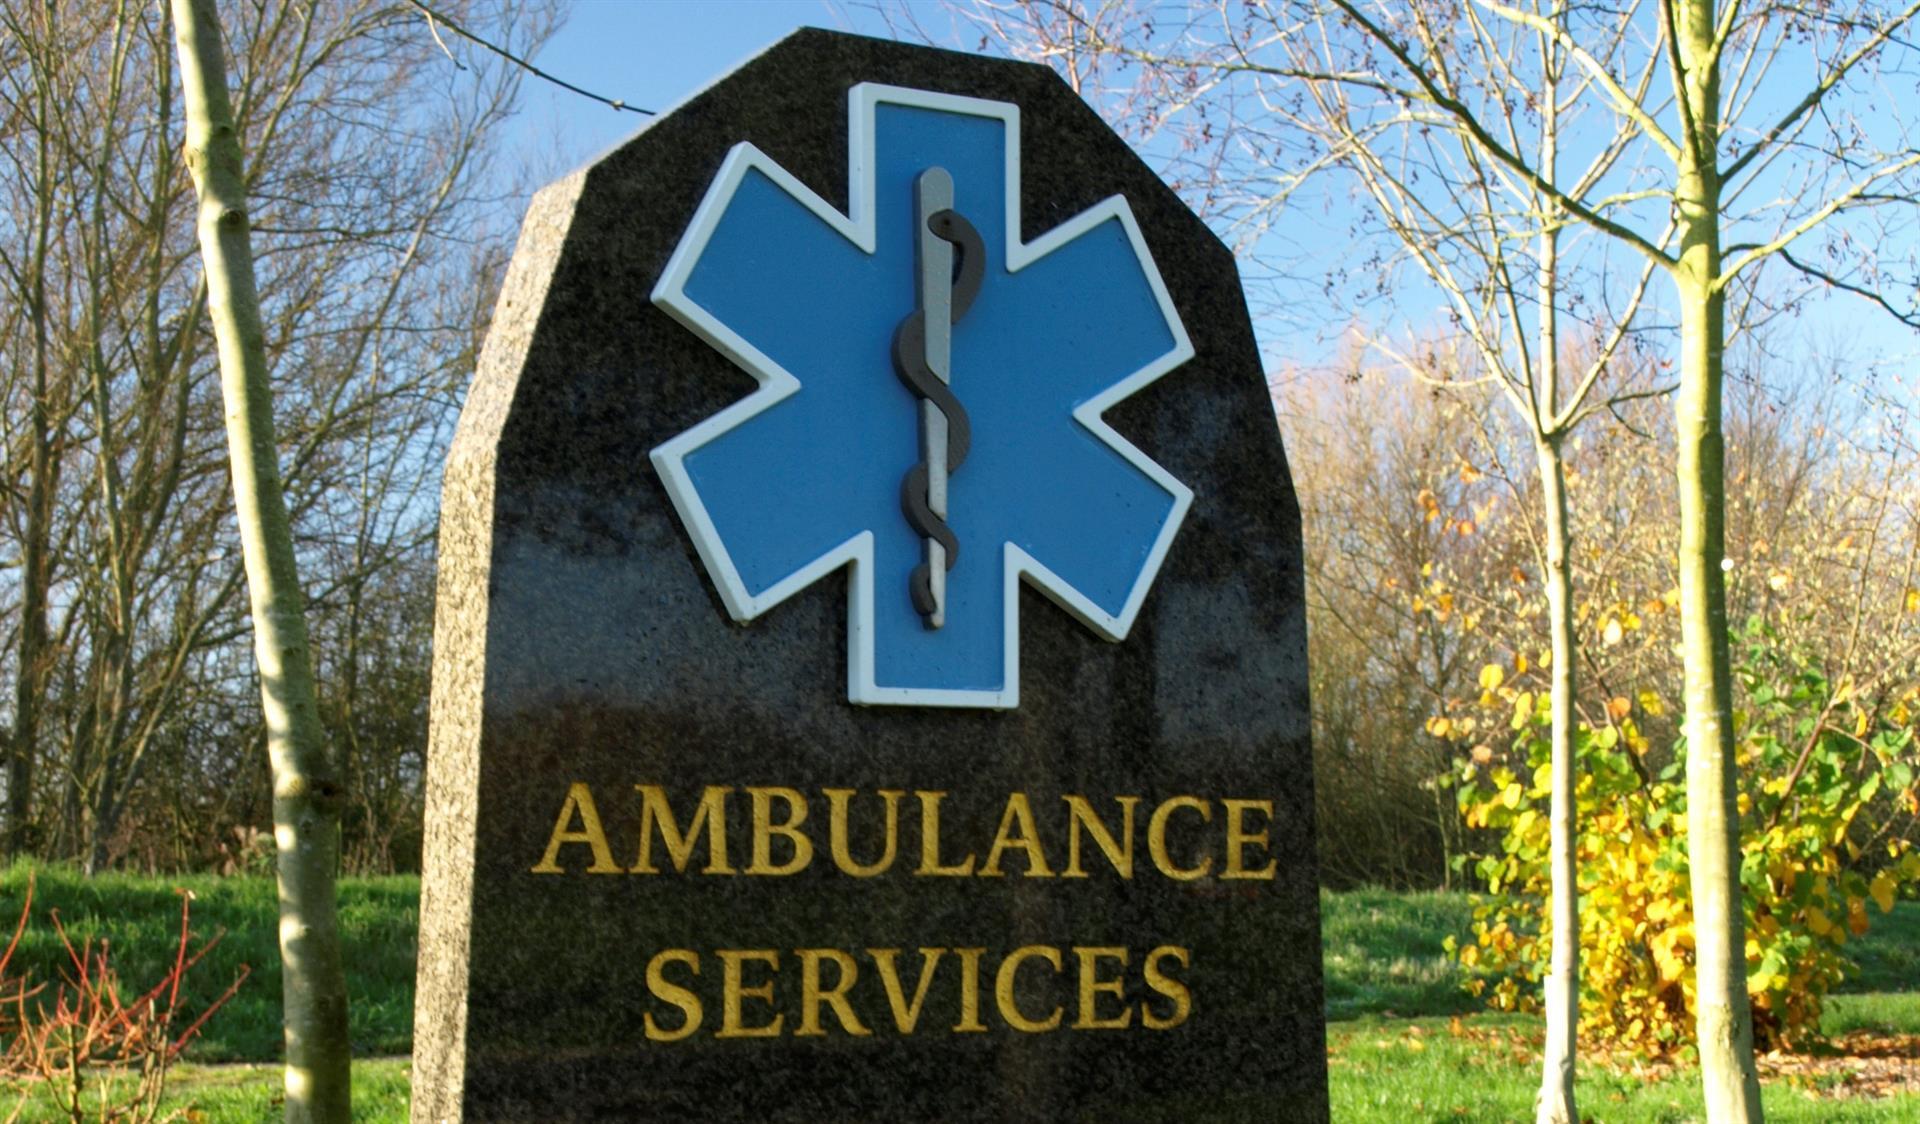 Ambulance Services Stone